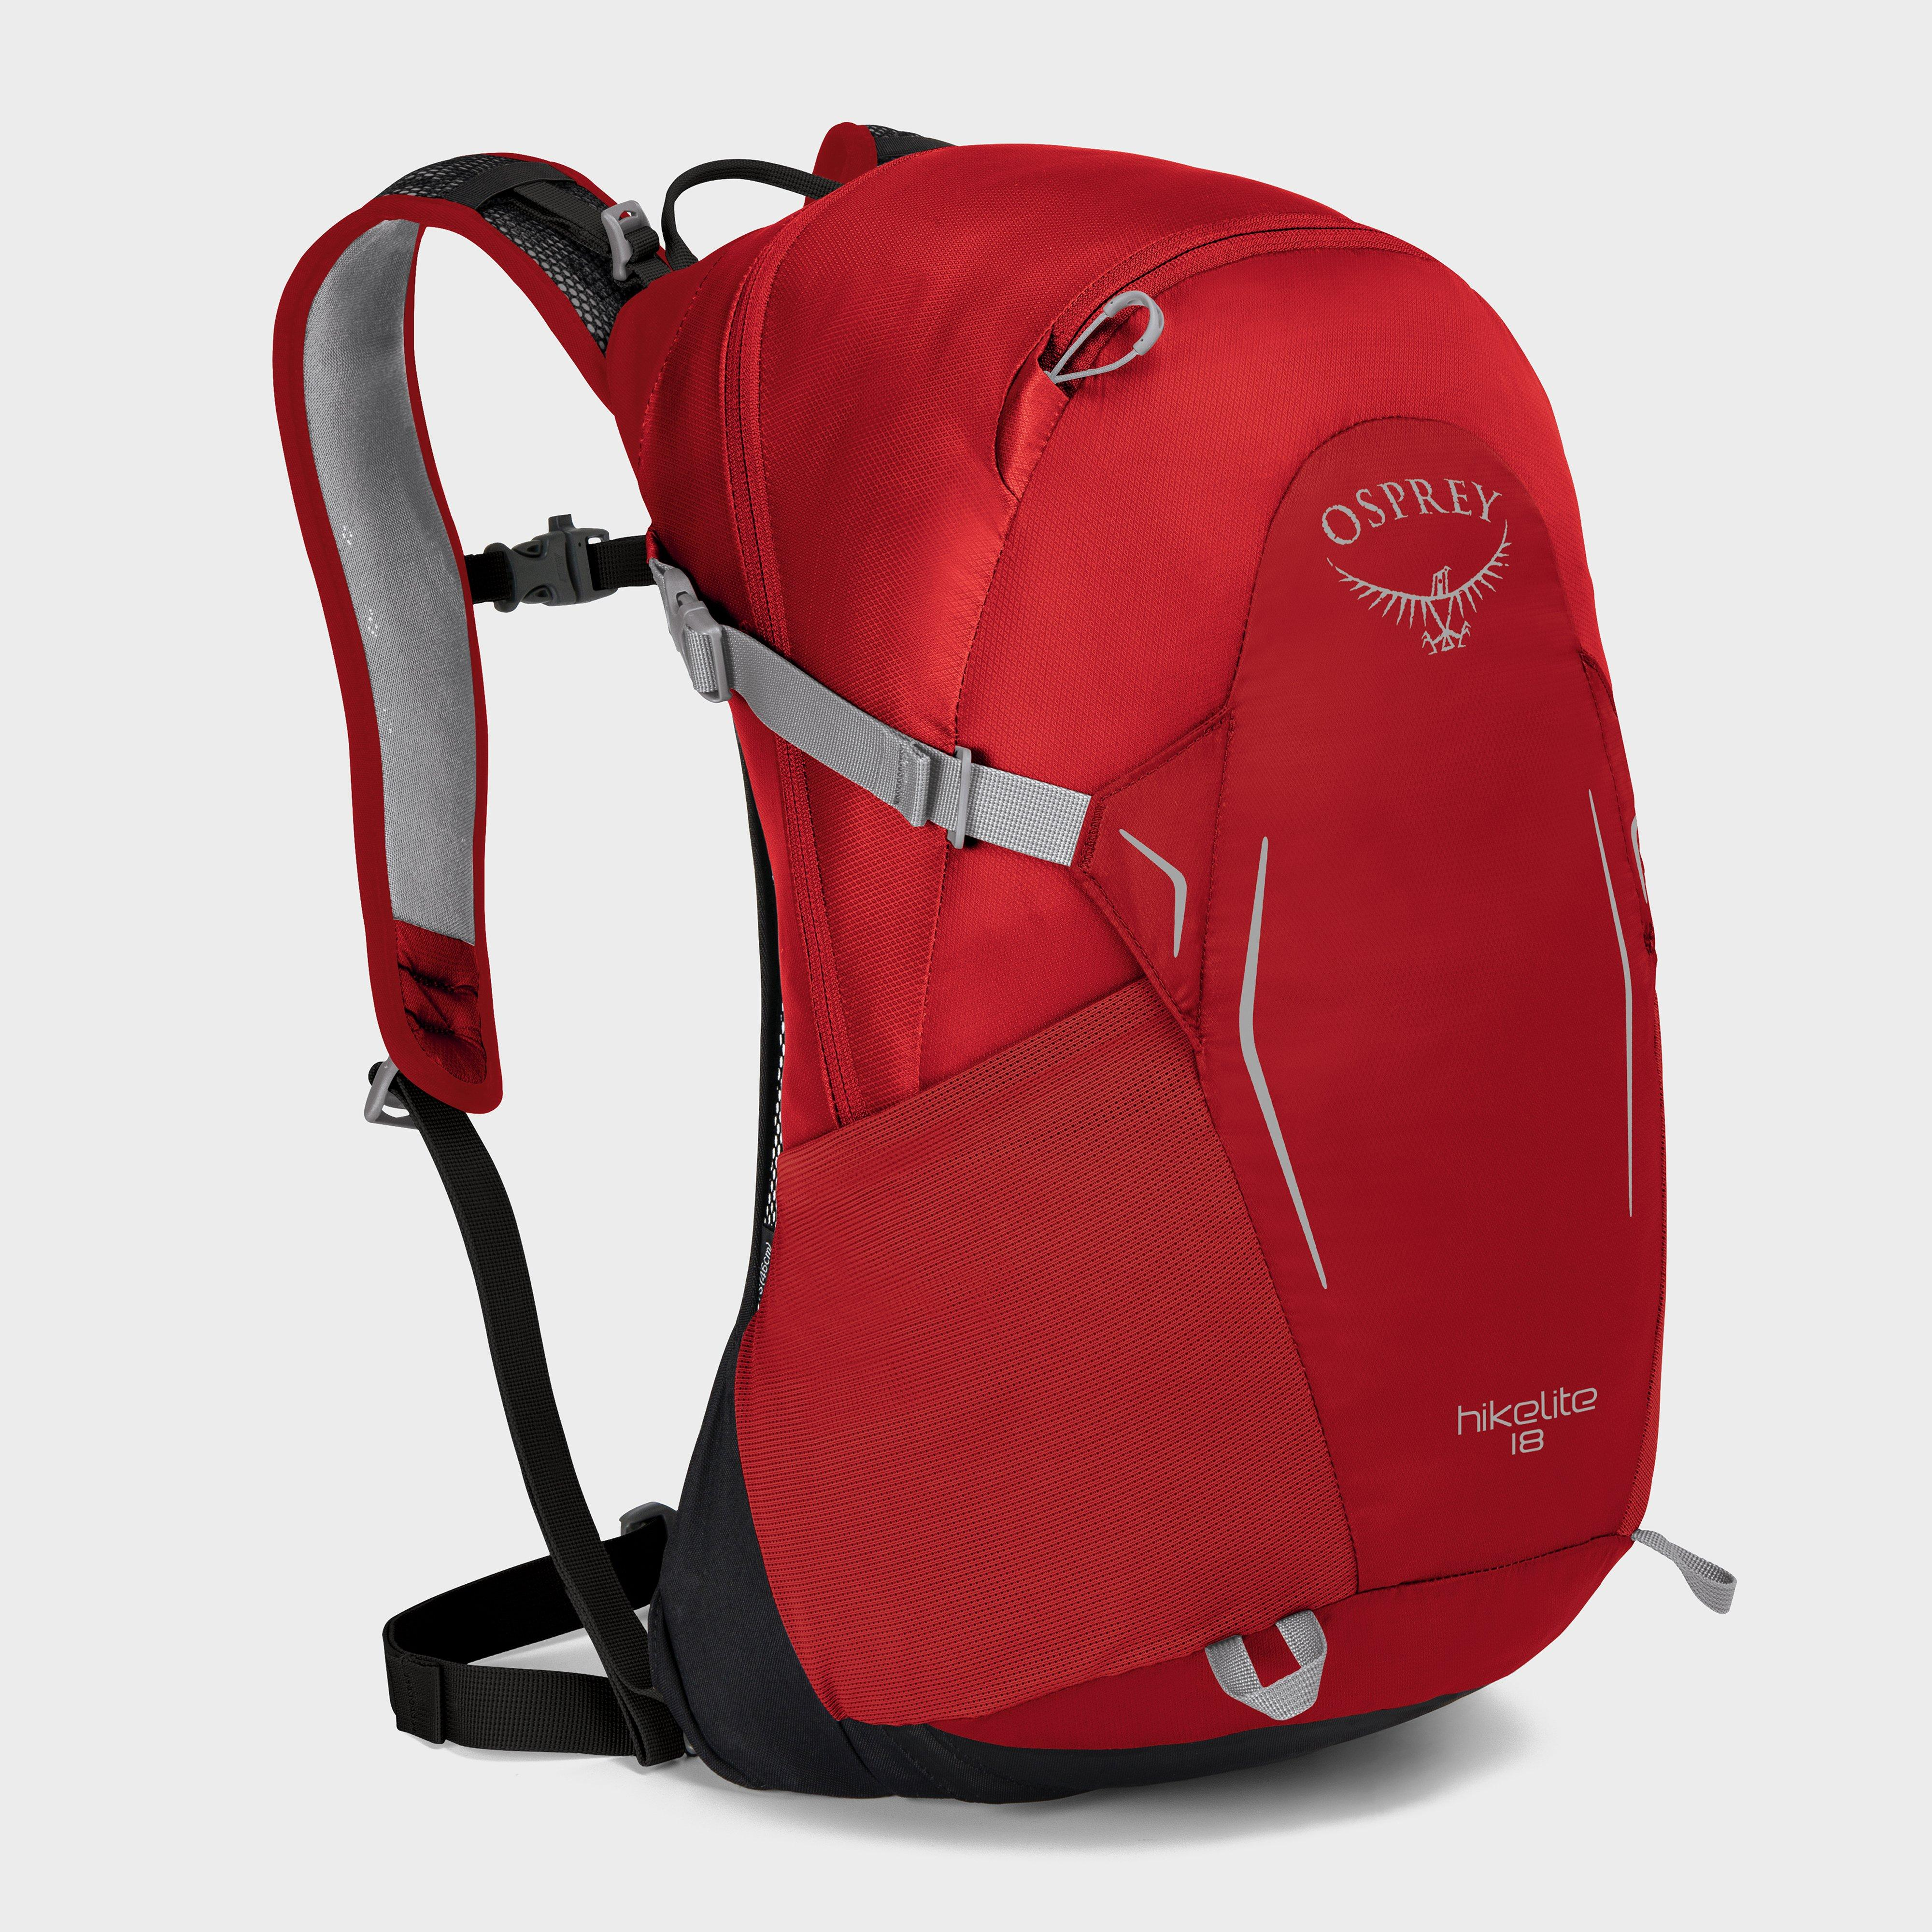 Osprey Hikelite 18 Daypack - Red, Red